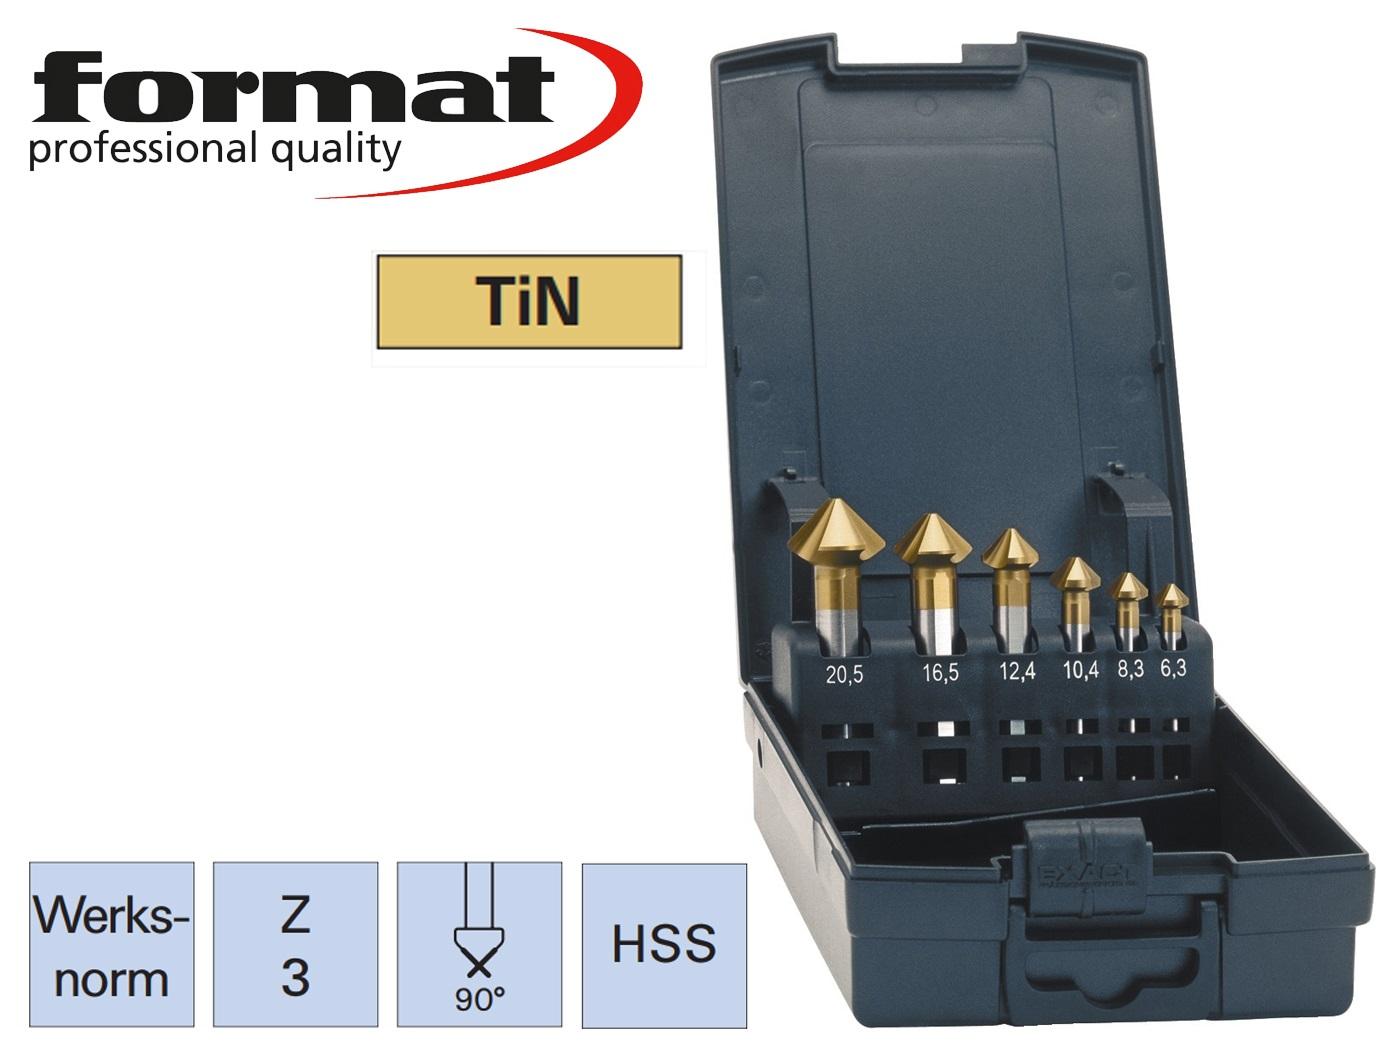 verzinkboor set DIN 335C HSS TiN ADVANCED exact   DKMTools - DKM Tools